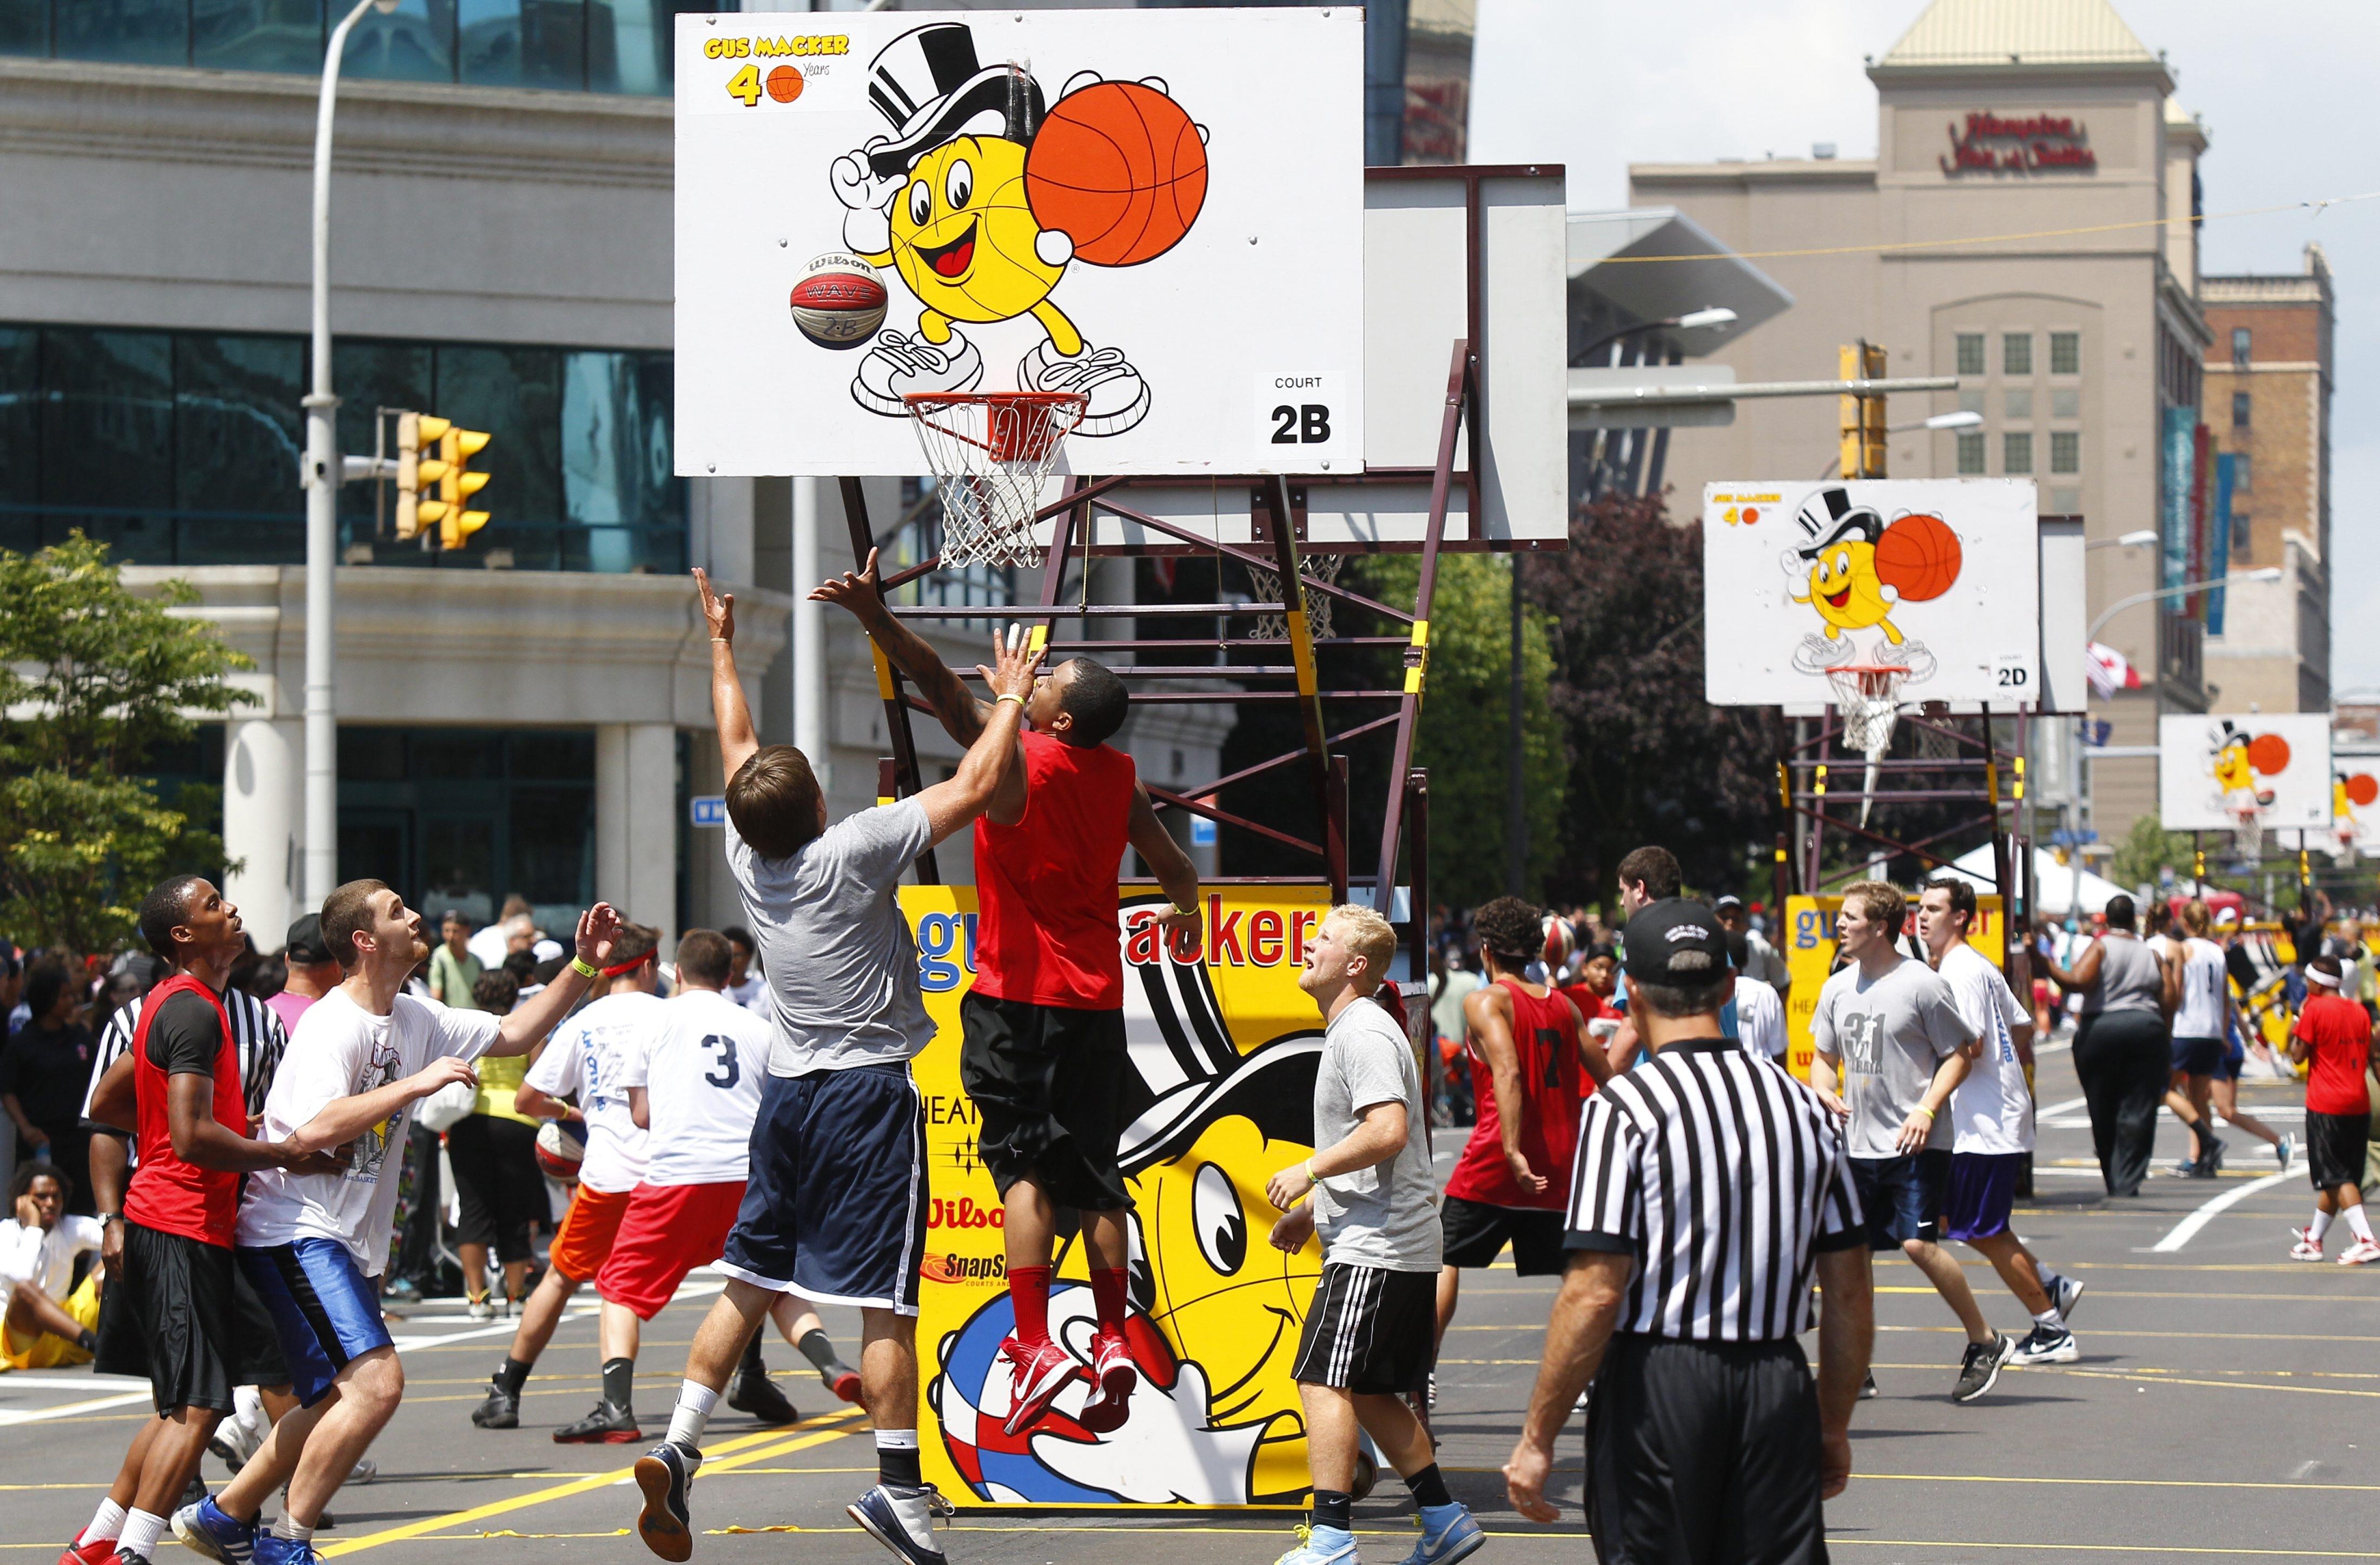 General action at last summer's Macker tournament on Buffalo streets. (Harry Scull Jr. / Buffalo News)